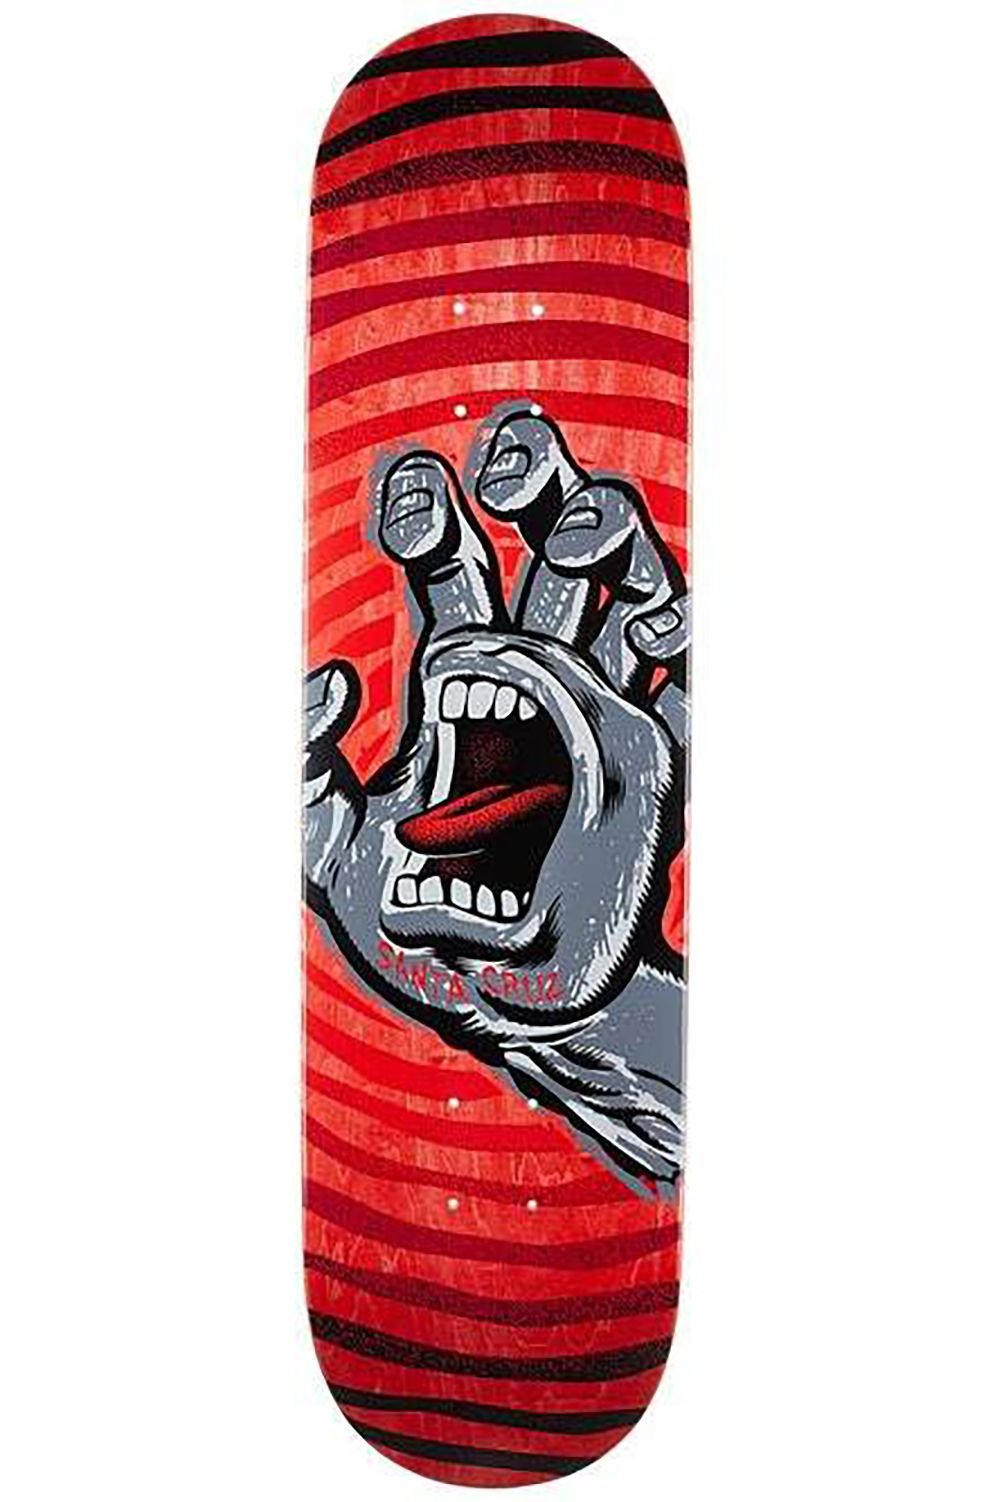 "Santa Cruz Skate Board OFF HAND HARD ROCK MAPLE 8.125"" x 31.7"" Red"